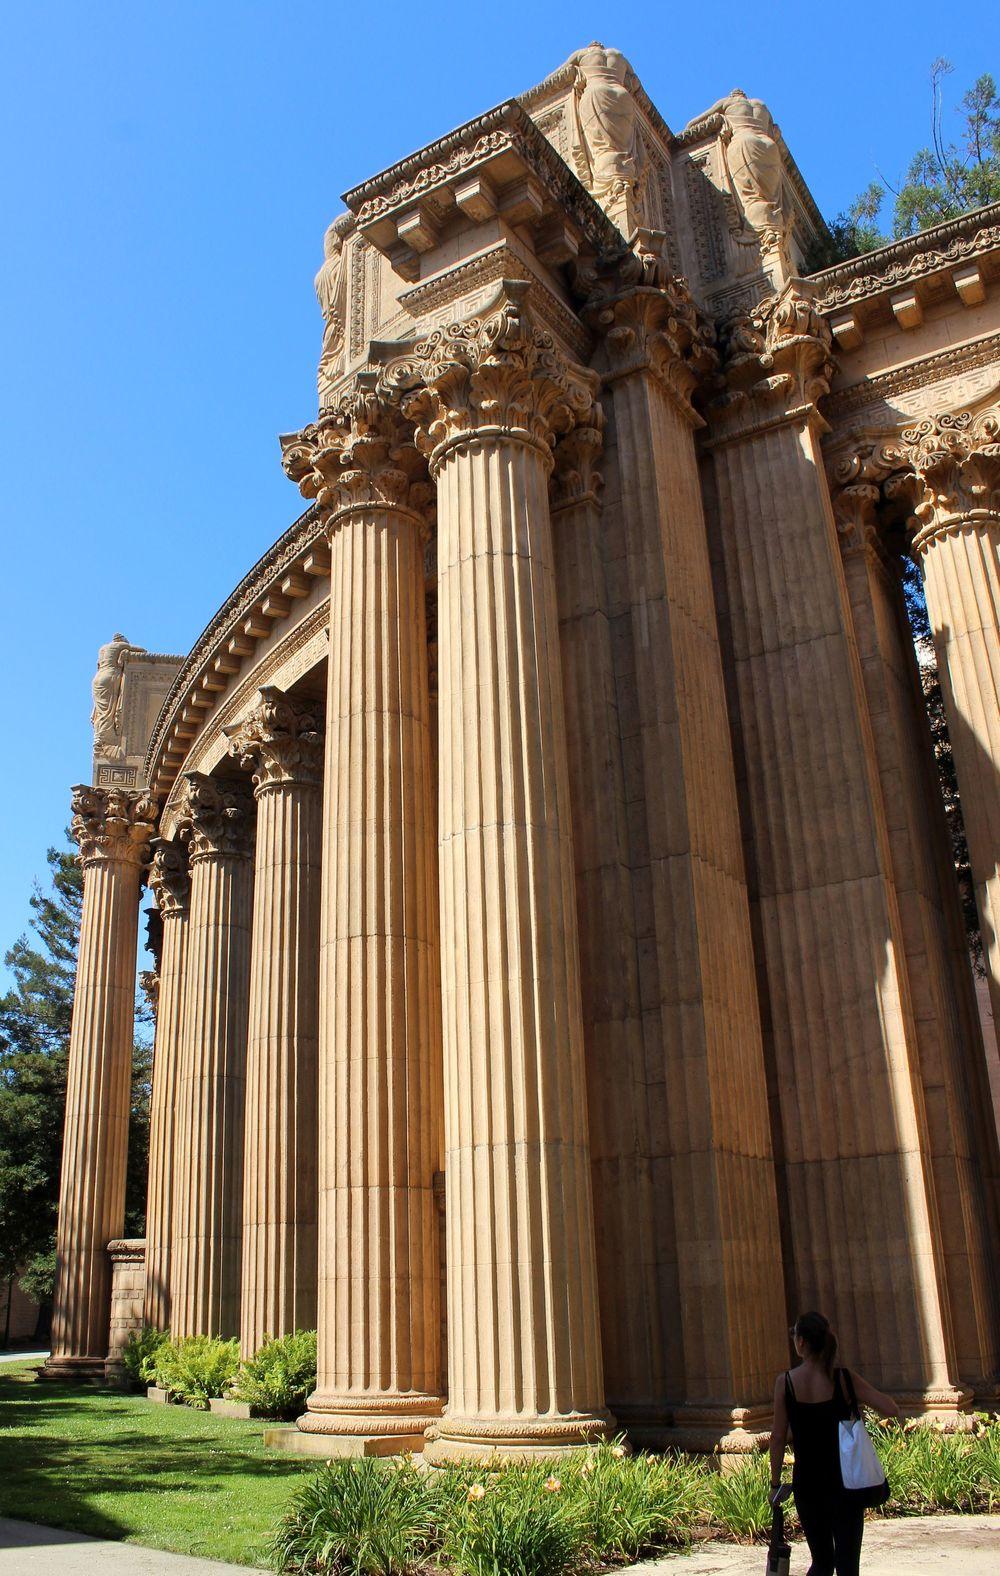 Palace of Fine Arts, San Francisco, CA, USA